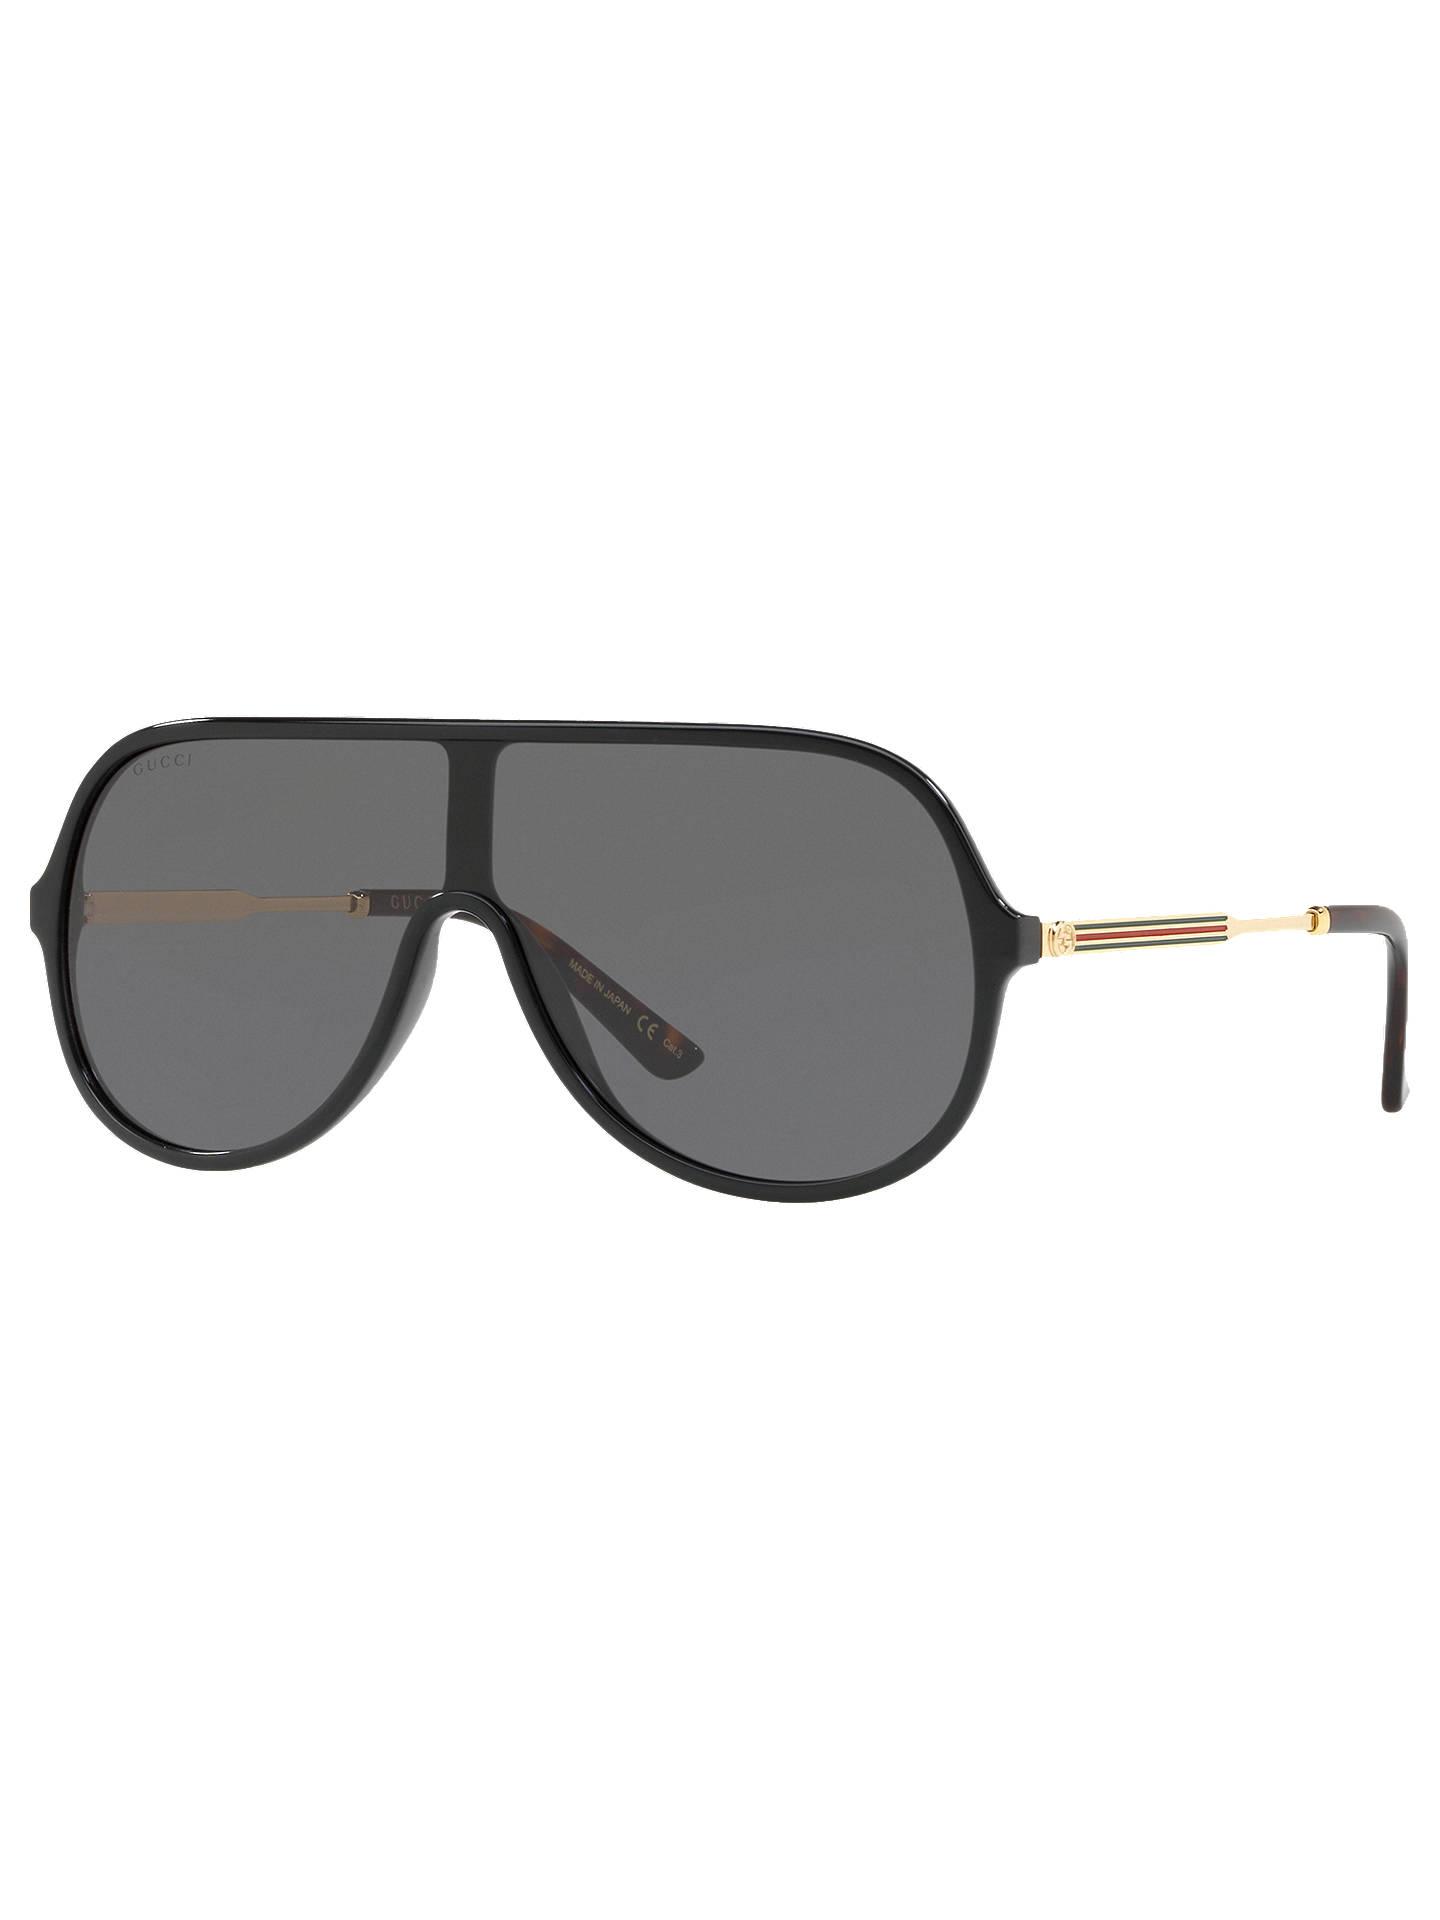 d561d09a9 Buy Gucci GG0199S Aviator Sunglasses, Black/Gold Online at johnlewis.com ...